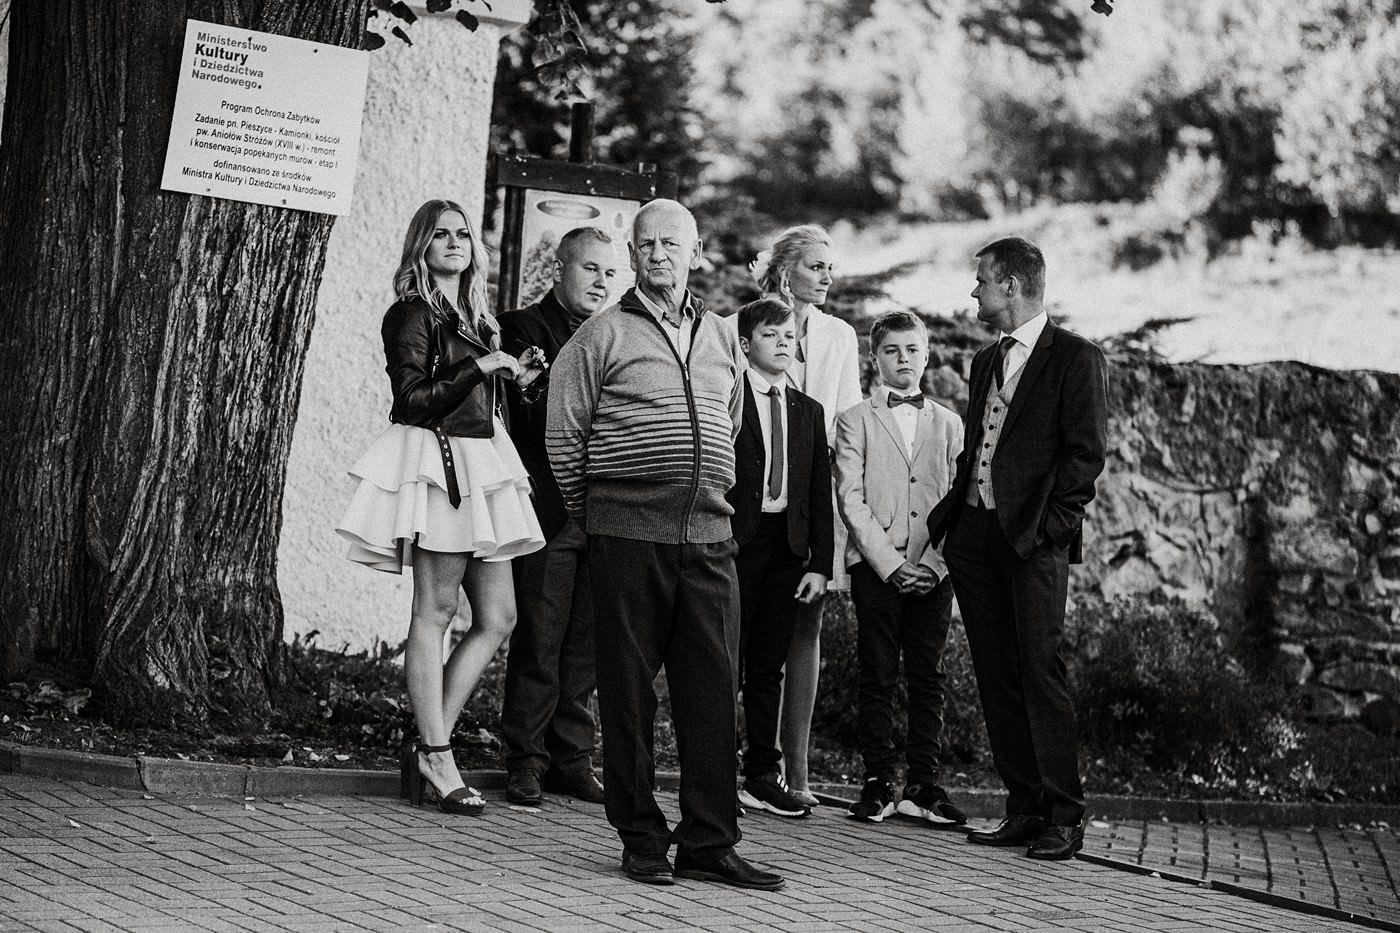 Martyna & Bartek - Wesele w Górach Sowich 37